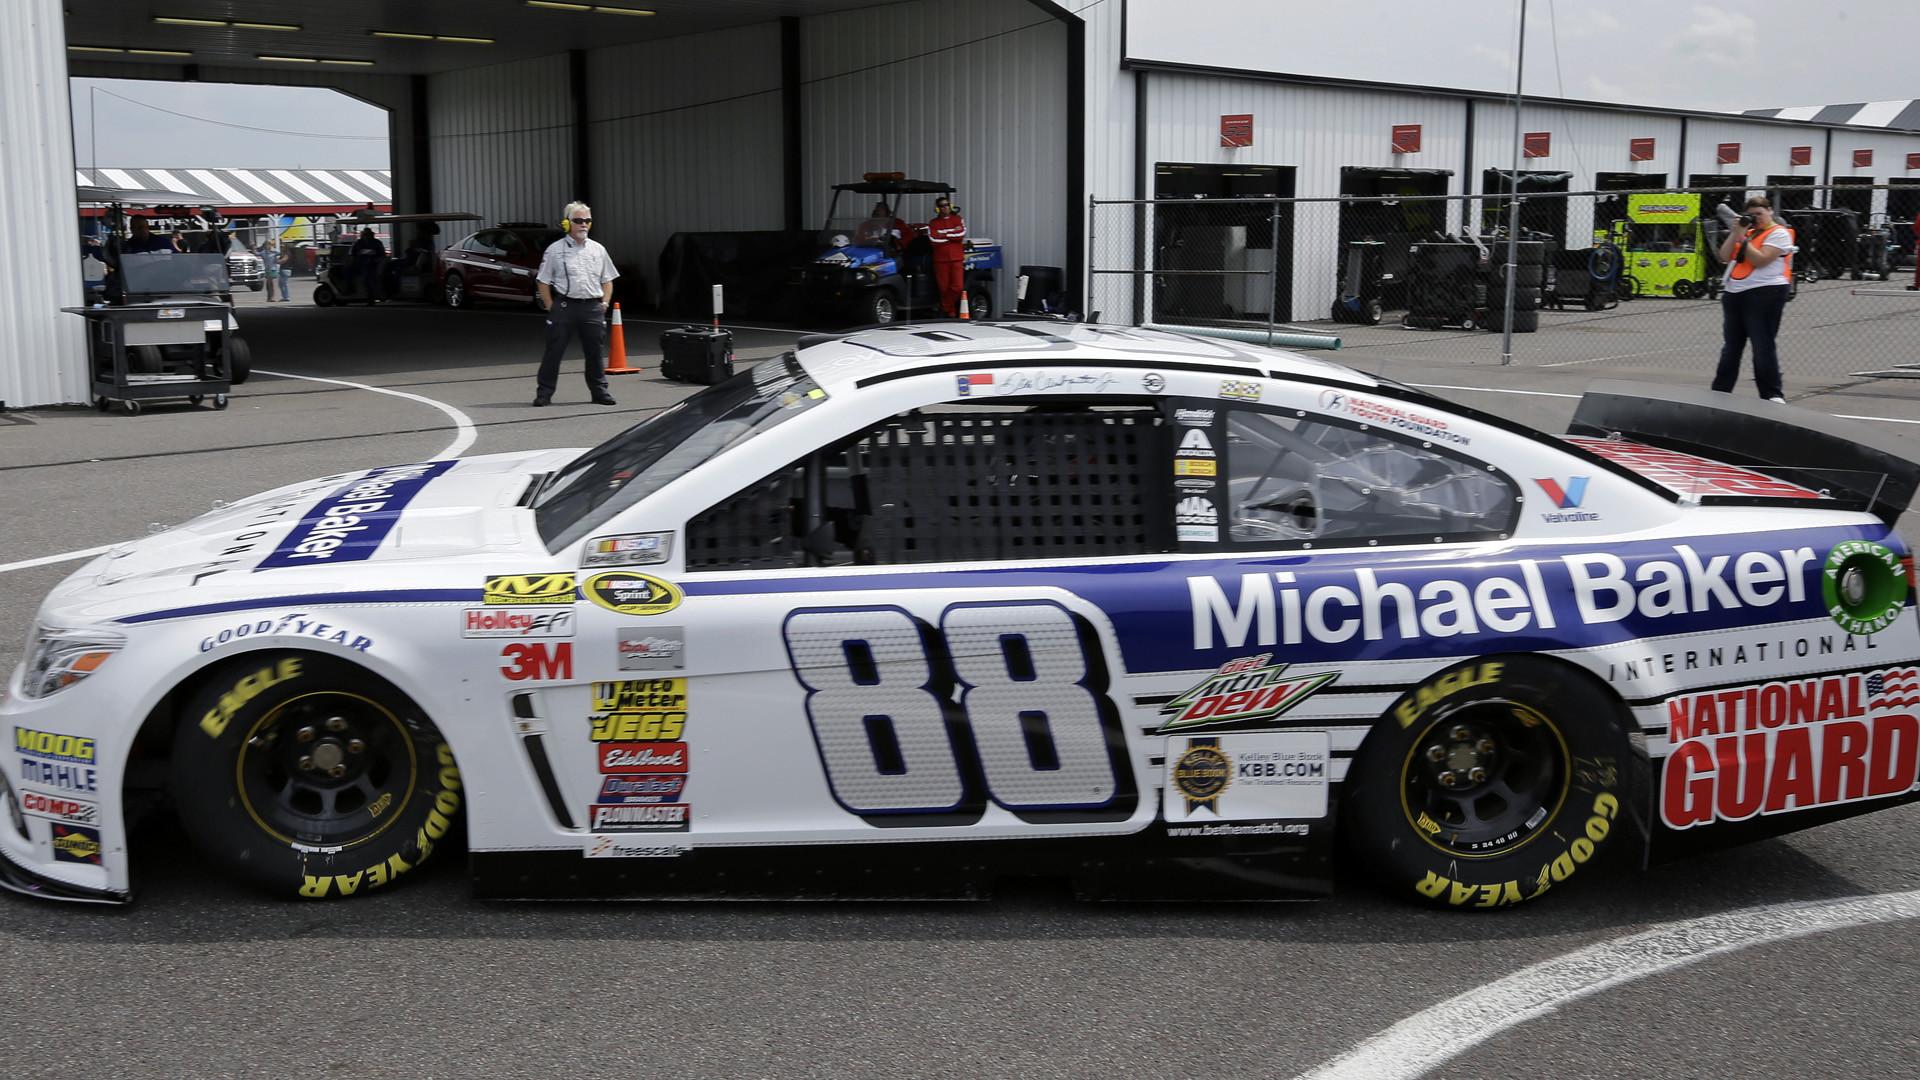 A wish list of new sponsors for Dale Earnhardt Jr. | NASCAR | Sporting News